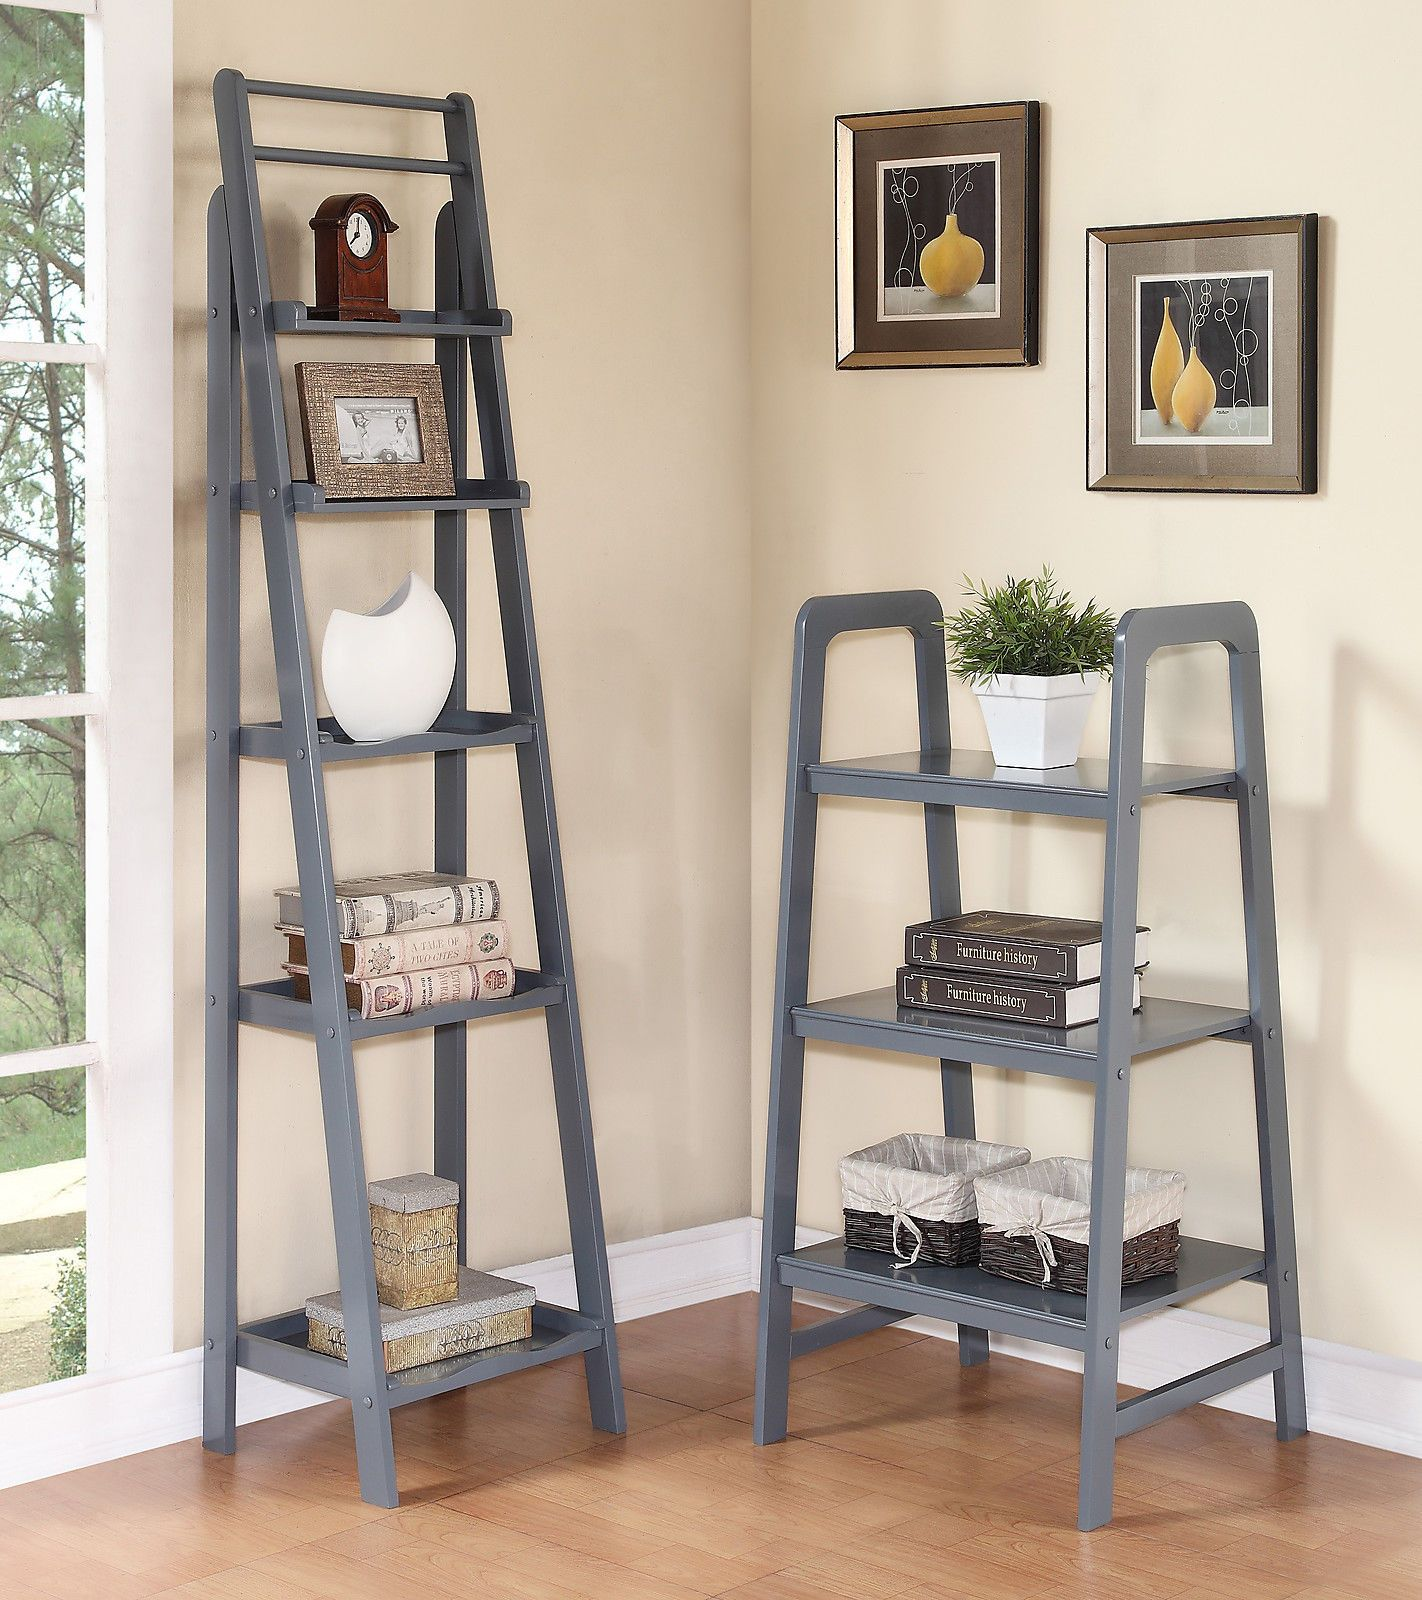 Modern Wood Ladder Rack Display Shelf Bookcase In Blue Gray Finish  # Ruffino Muebles & Deco San Telmo